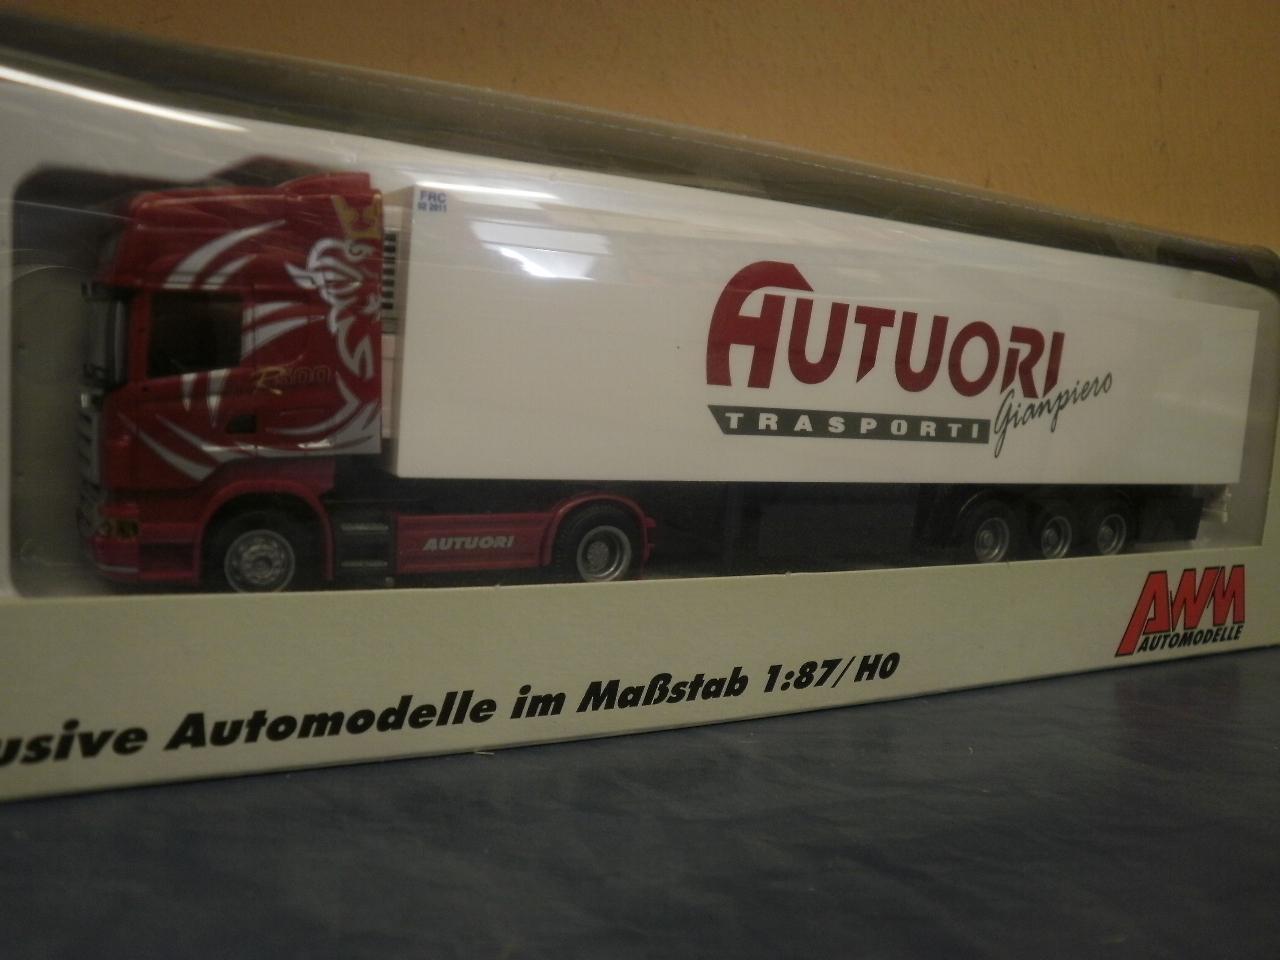 Auto- & Verkehrsmodelle Kühlaggregat Carrier 2 Stück 1:87